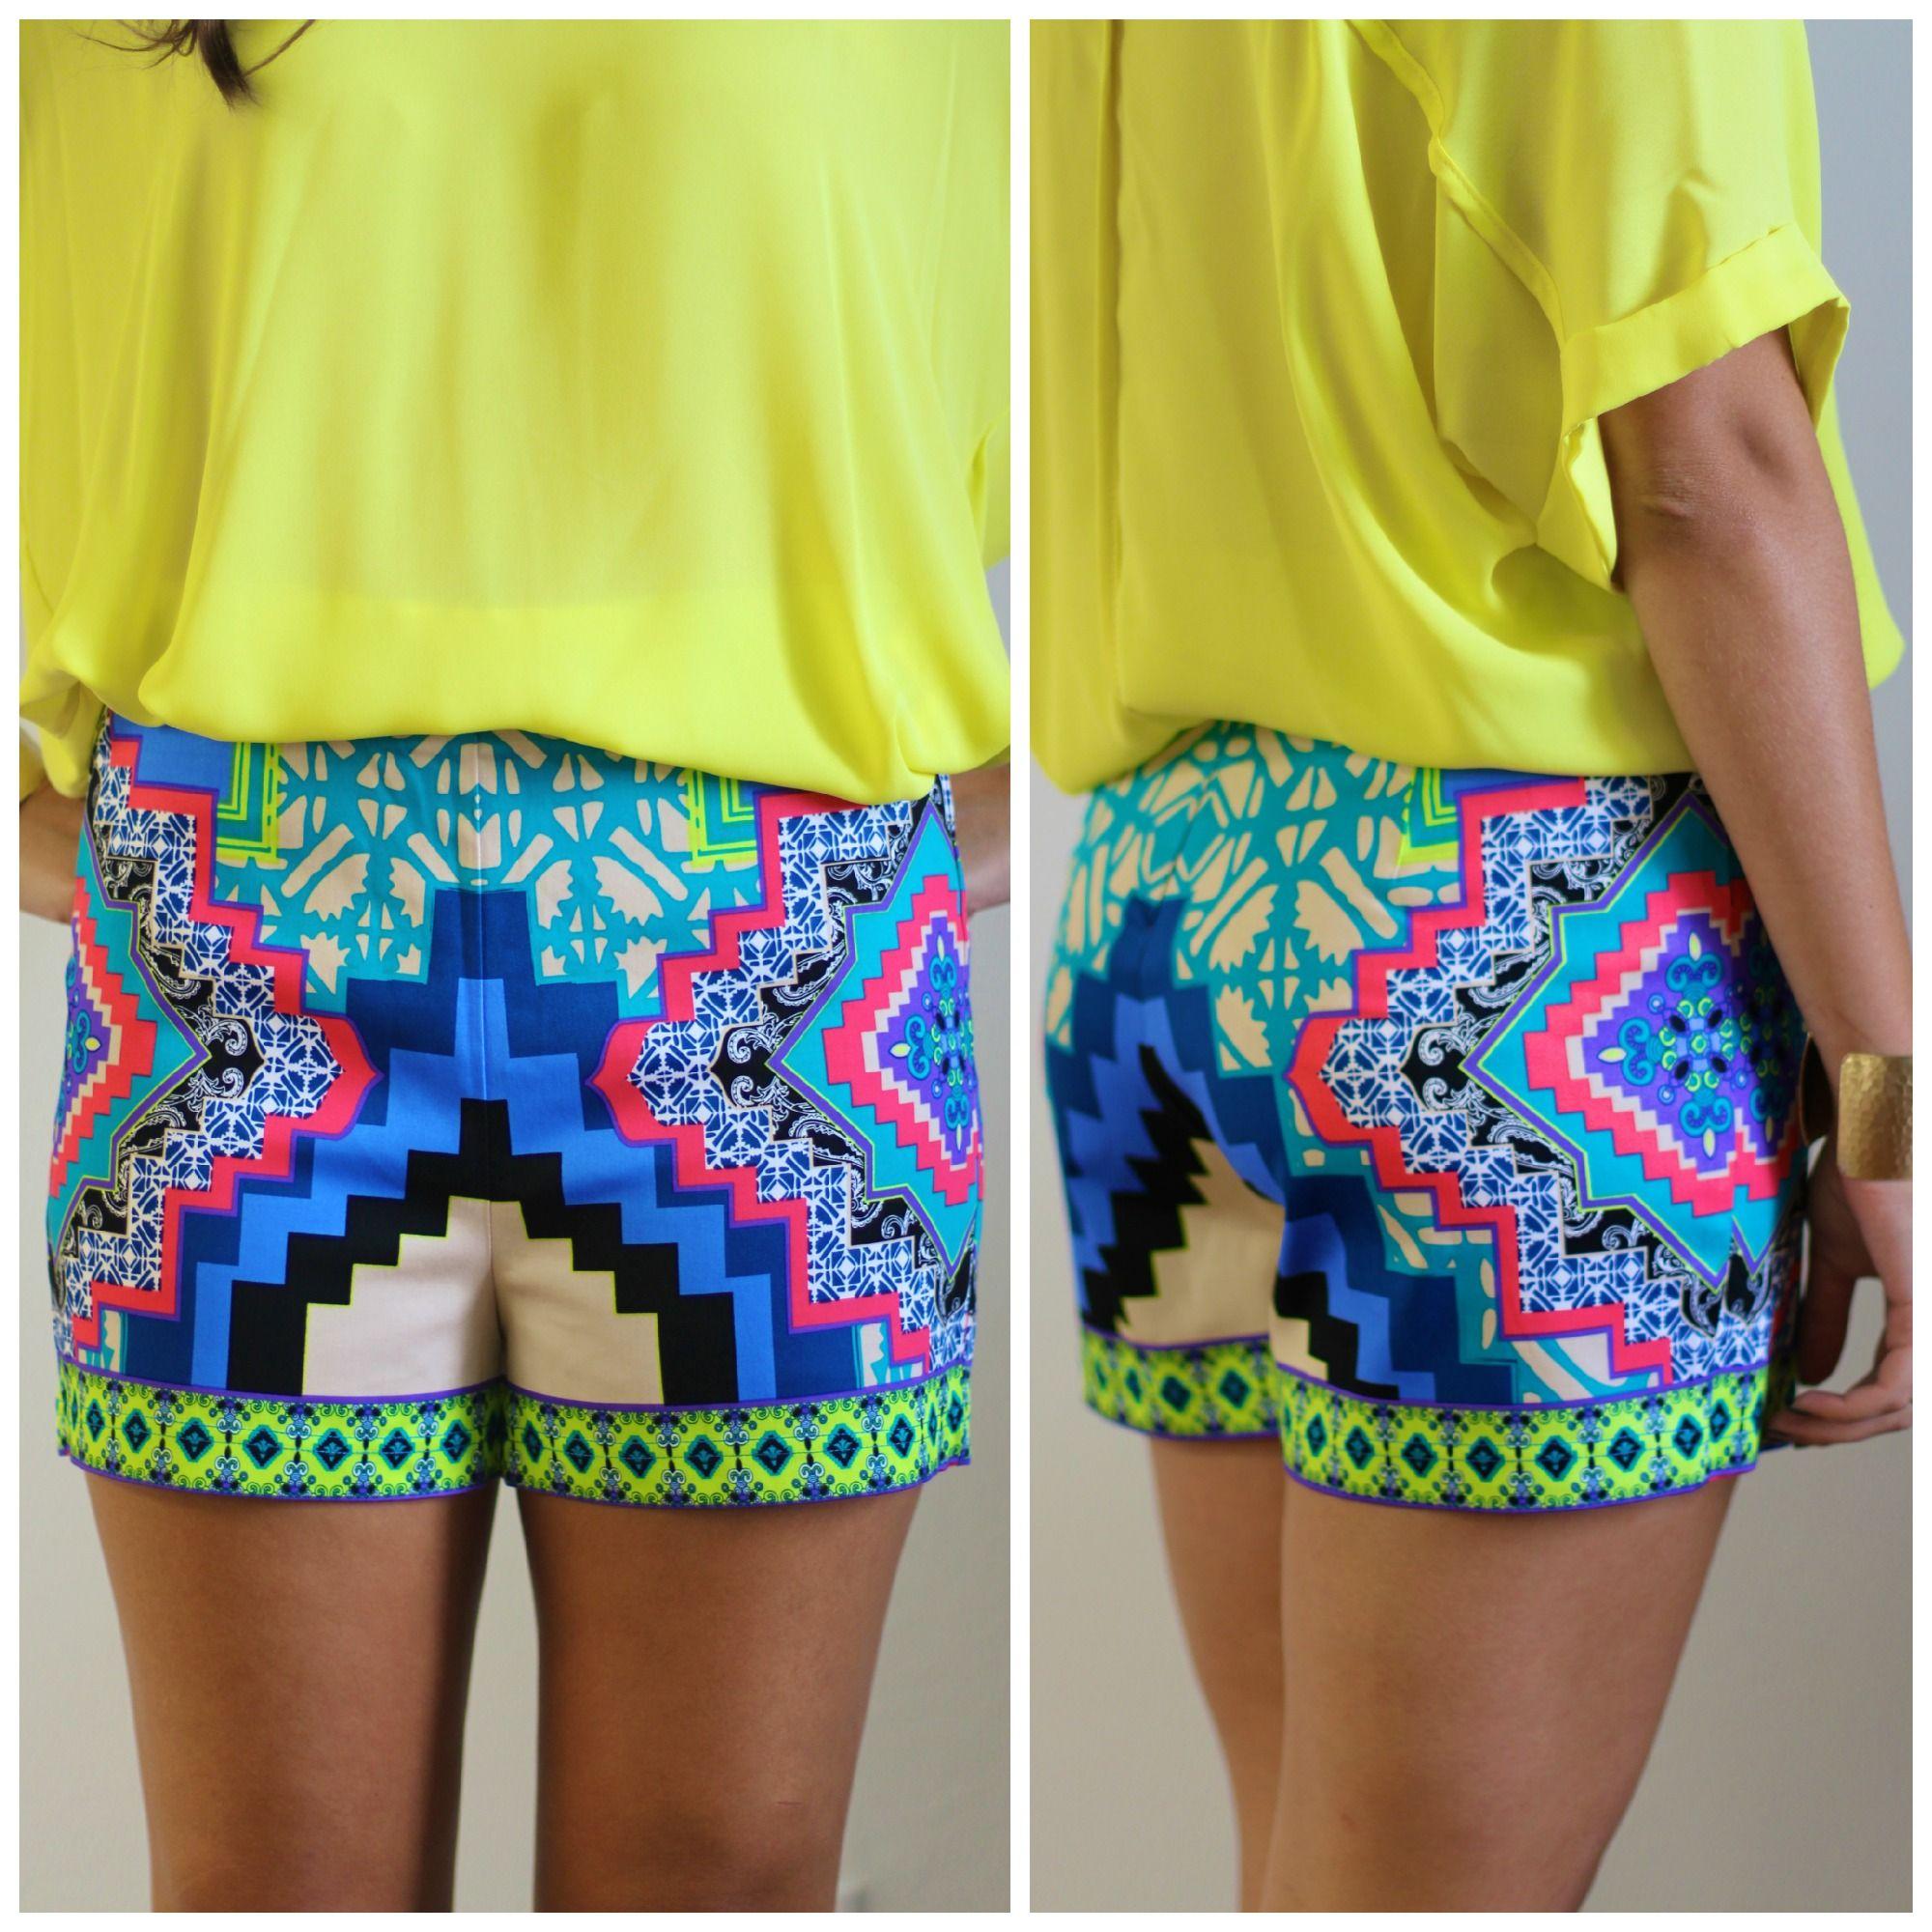 Graphic printed high waist shorts